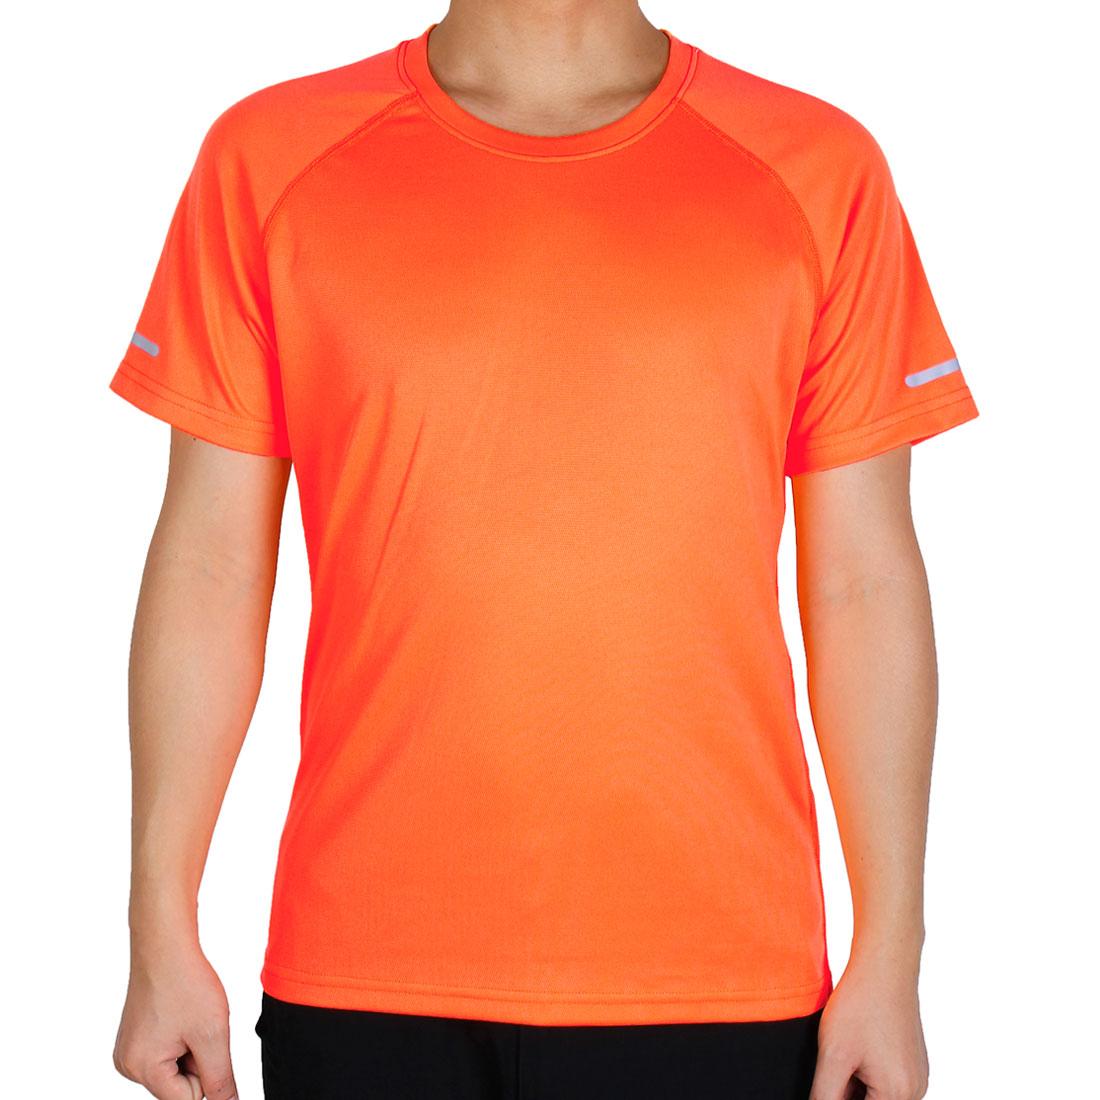 Men Moisture Wicking Short Sleeve Tee Outdoor Exercise Sports T-shirt Orange S